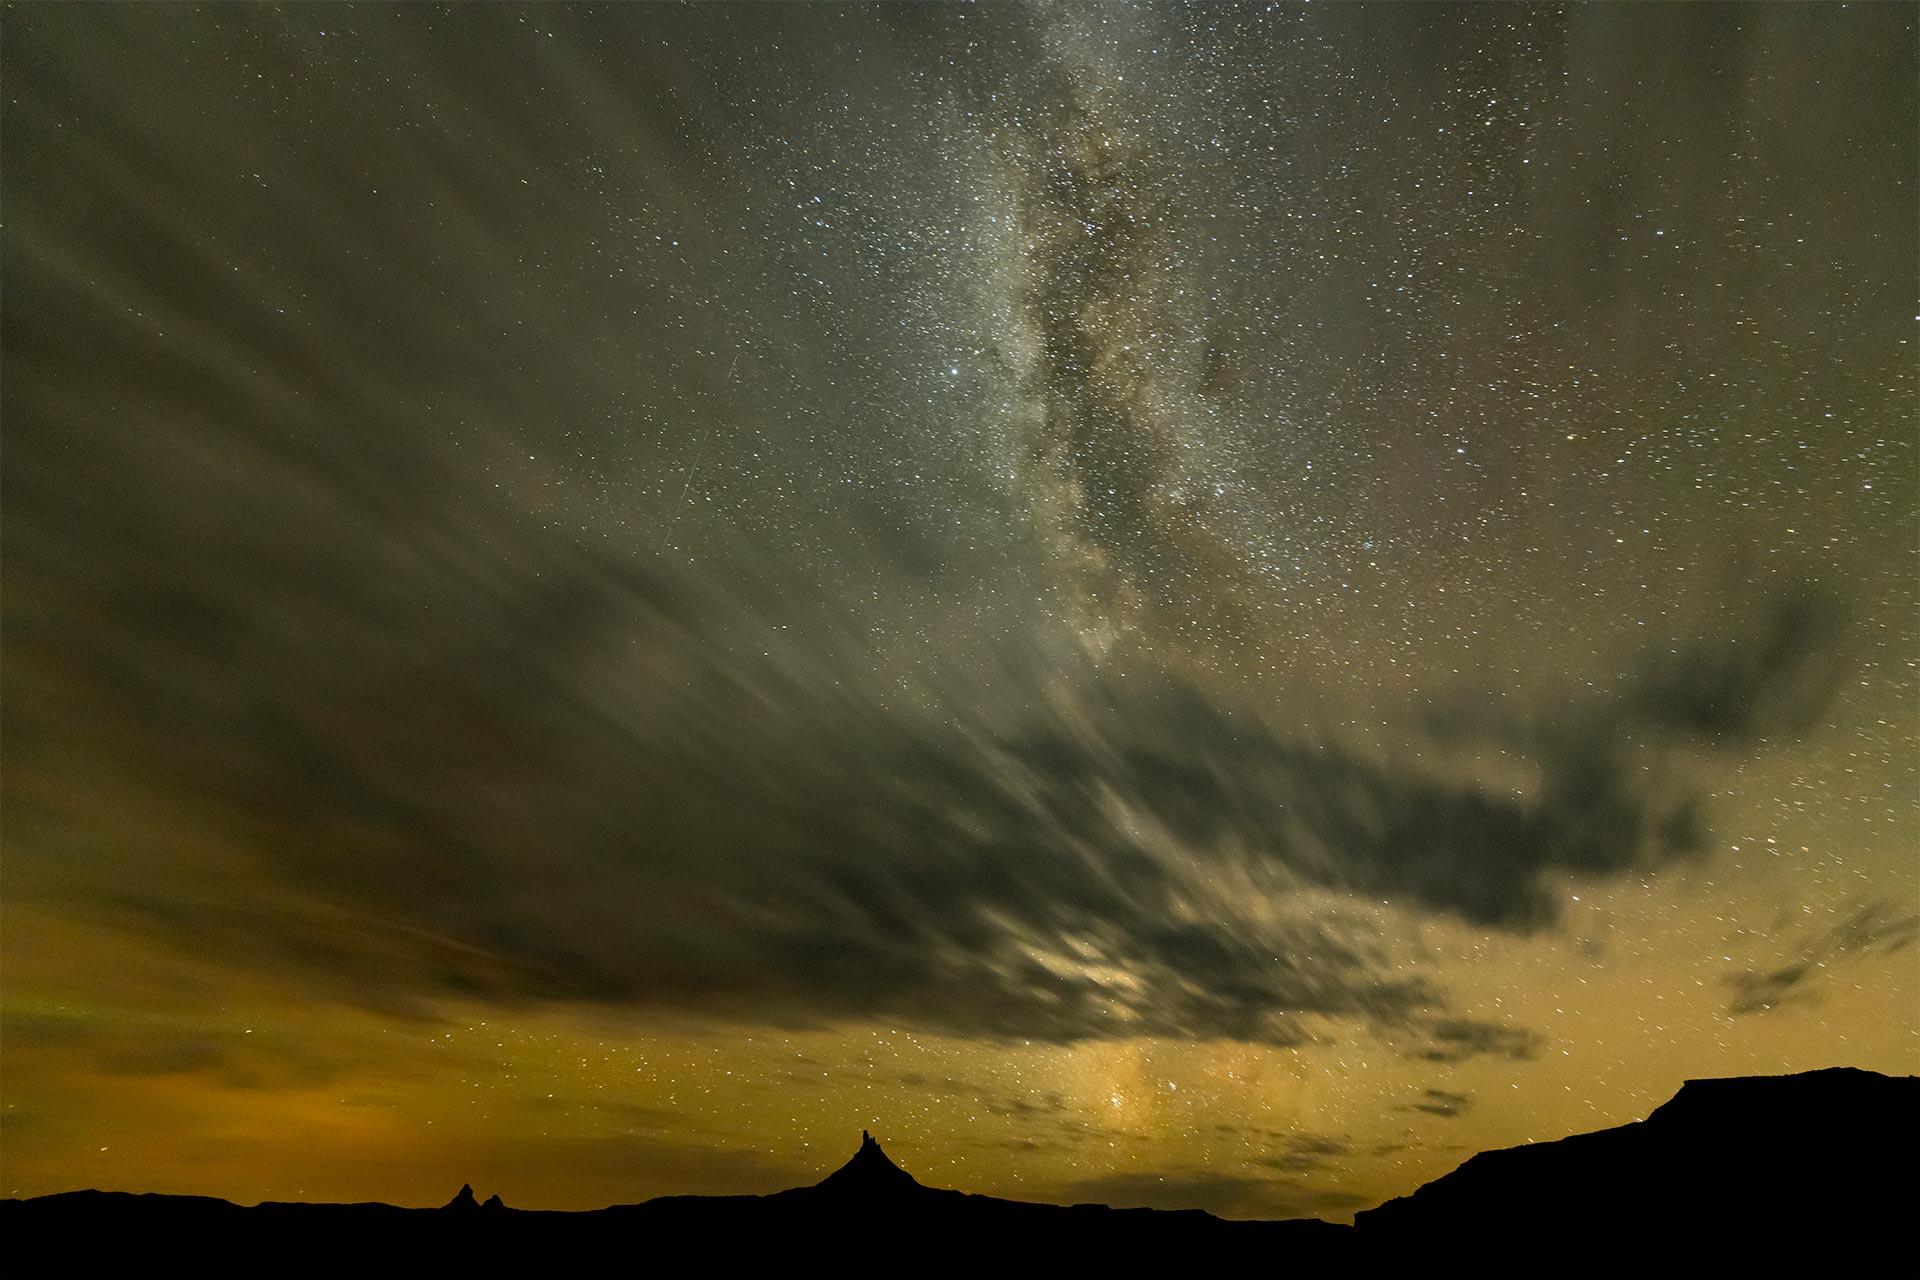 milky-way-night-sky-photography-Utah-Canyonlands-national-park-Needles_District